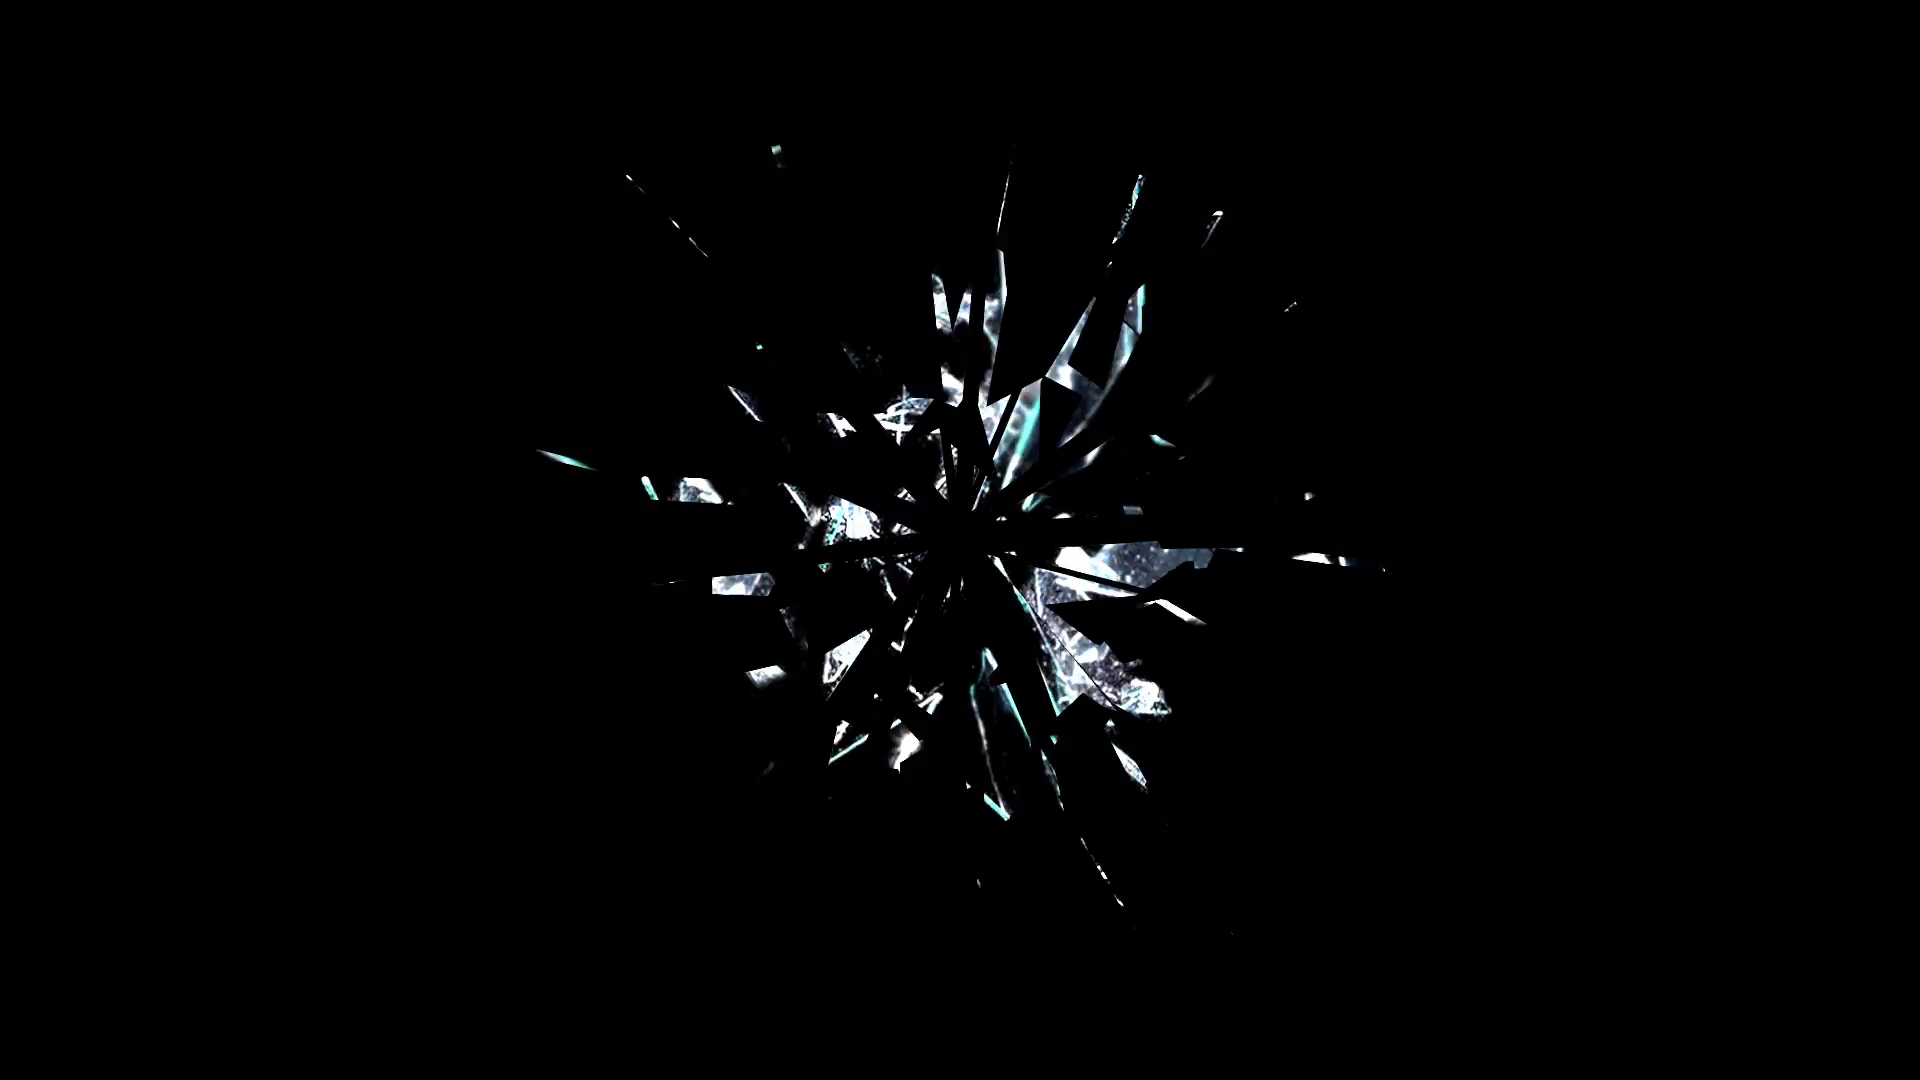 Broken Glass Animation Motion Background - Videoblocks